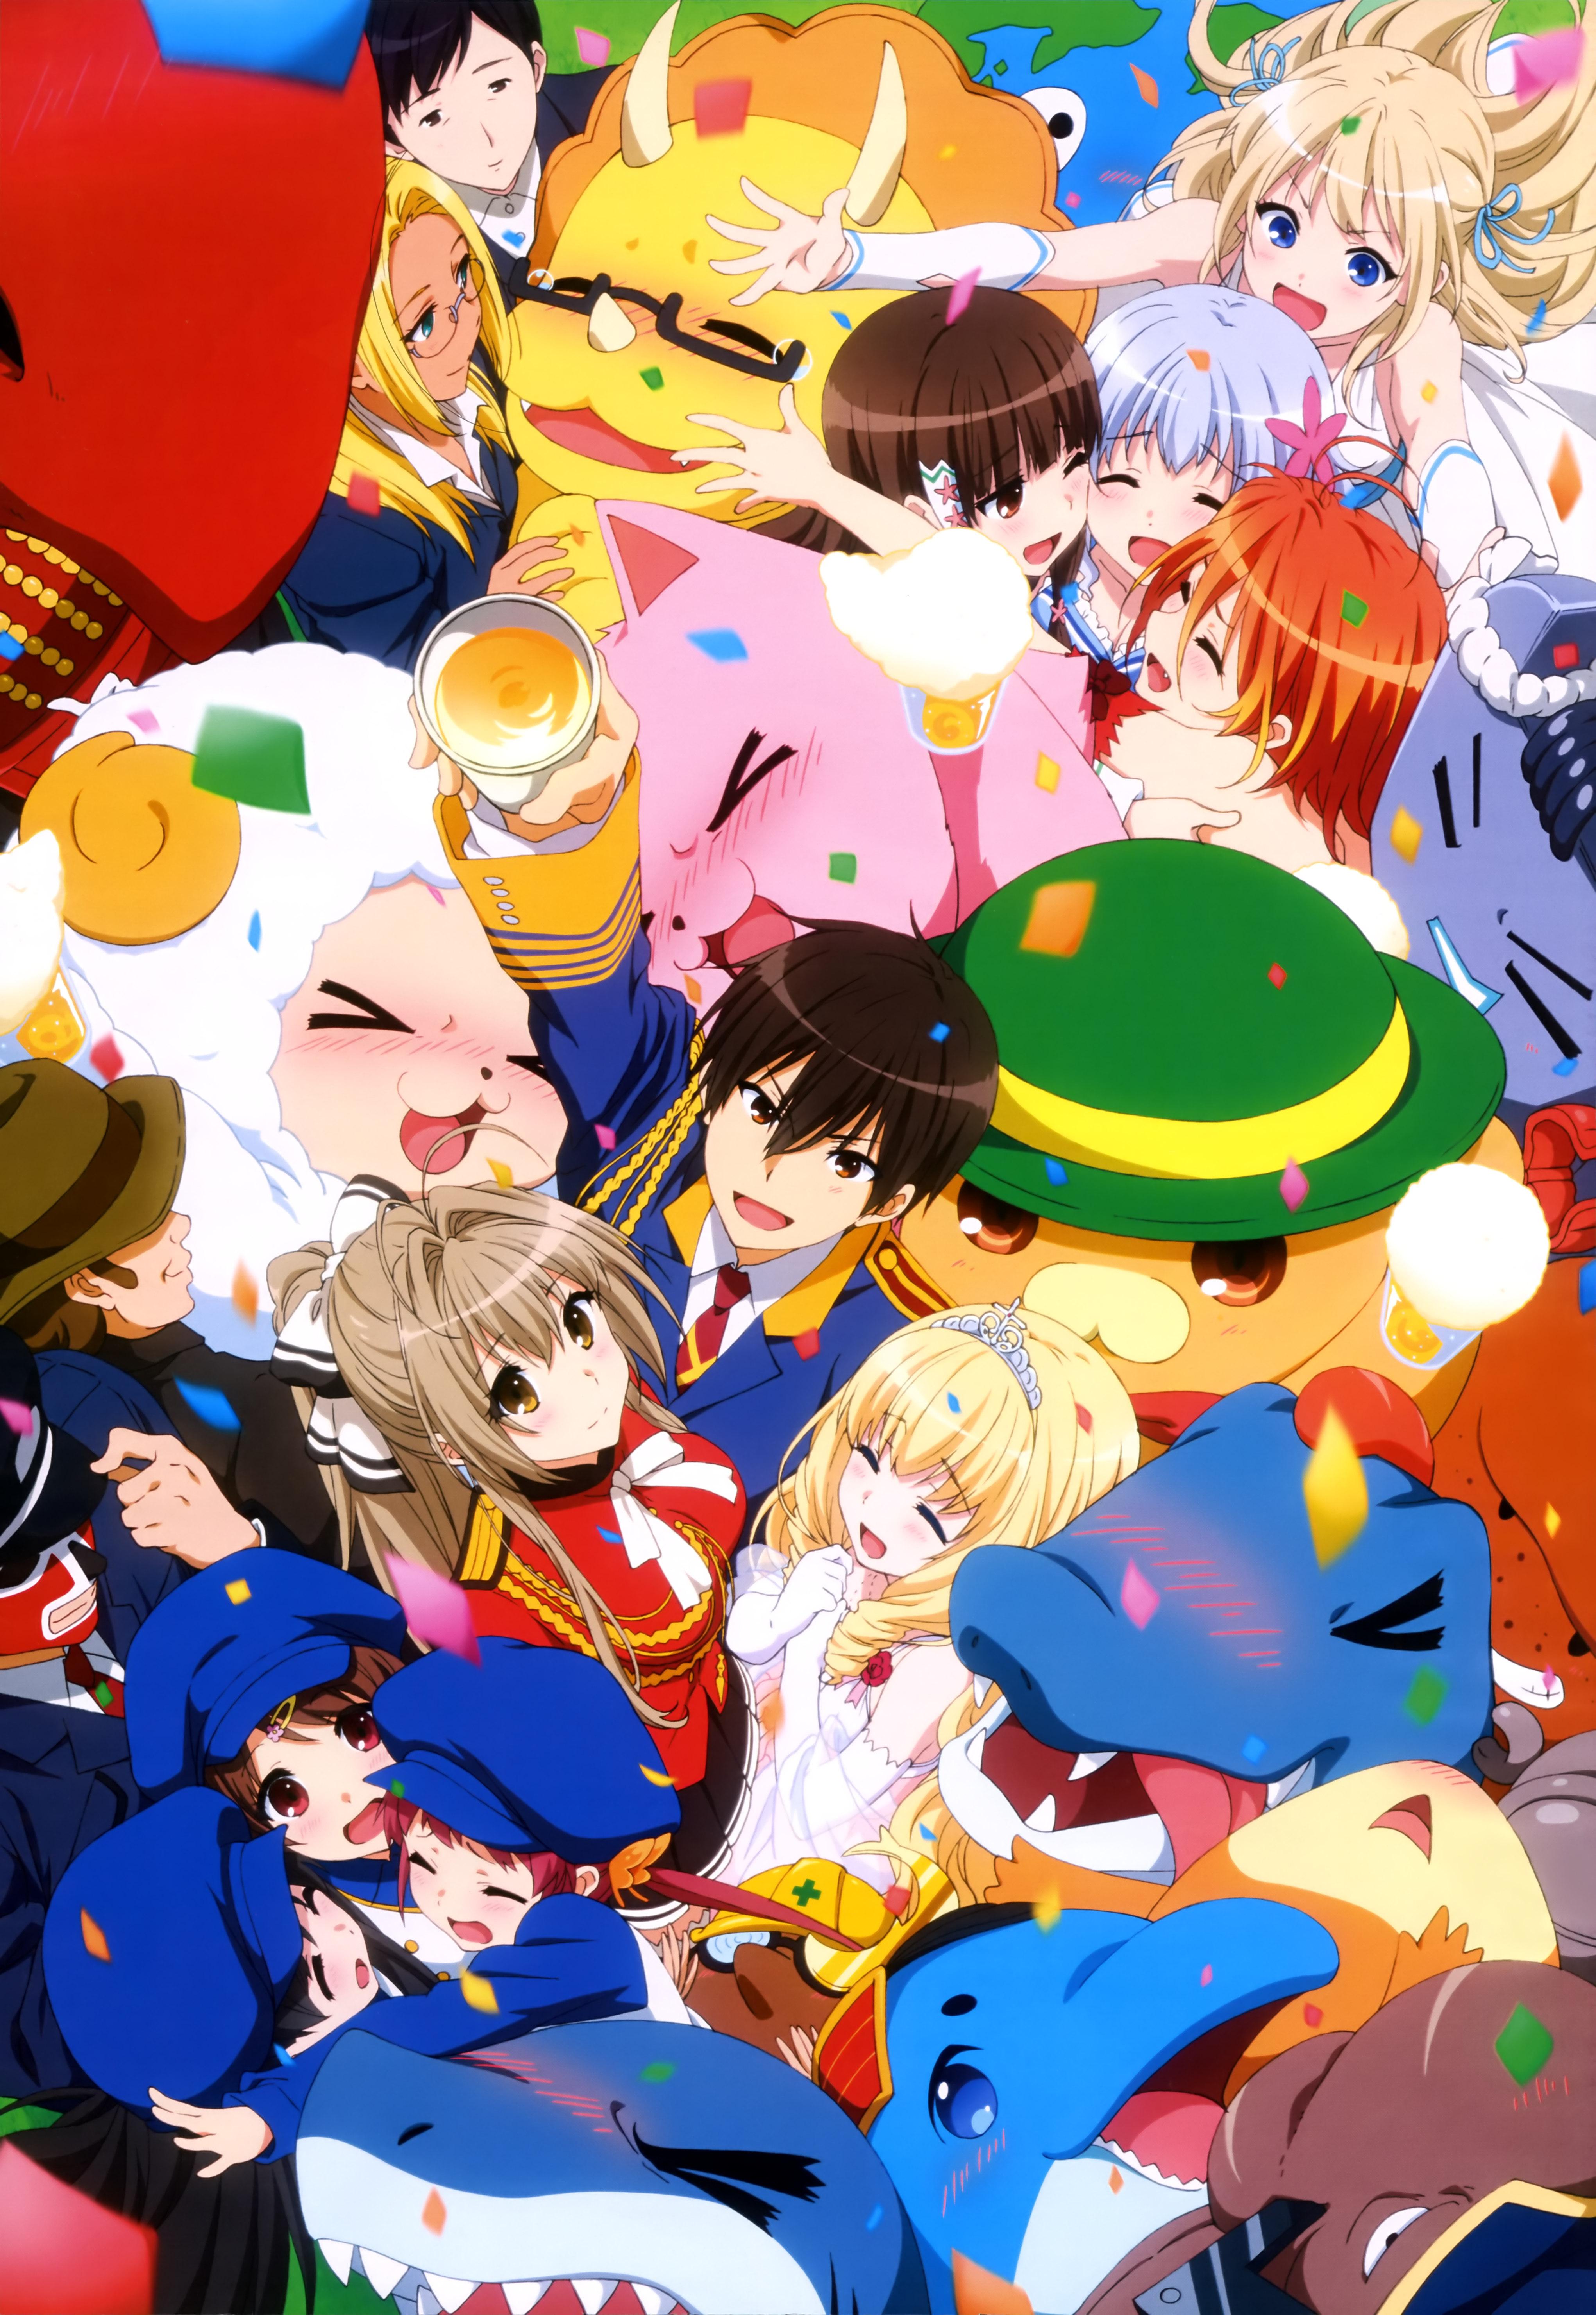 NyanType Magazine April 2015 anime posters Haruhichan.com amagi brilliant park